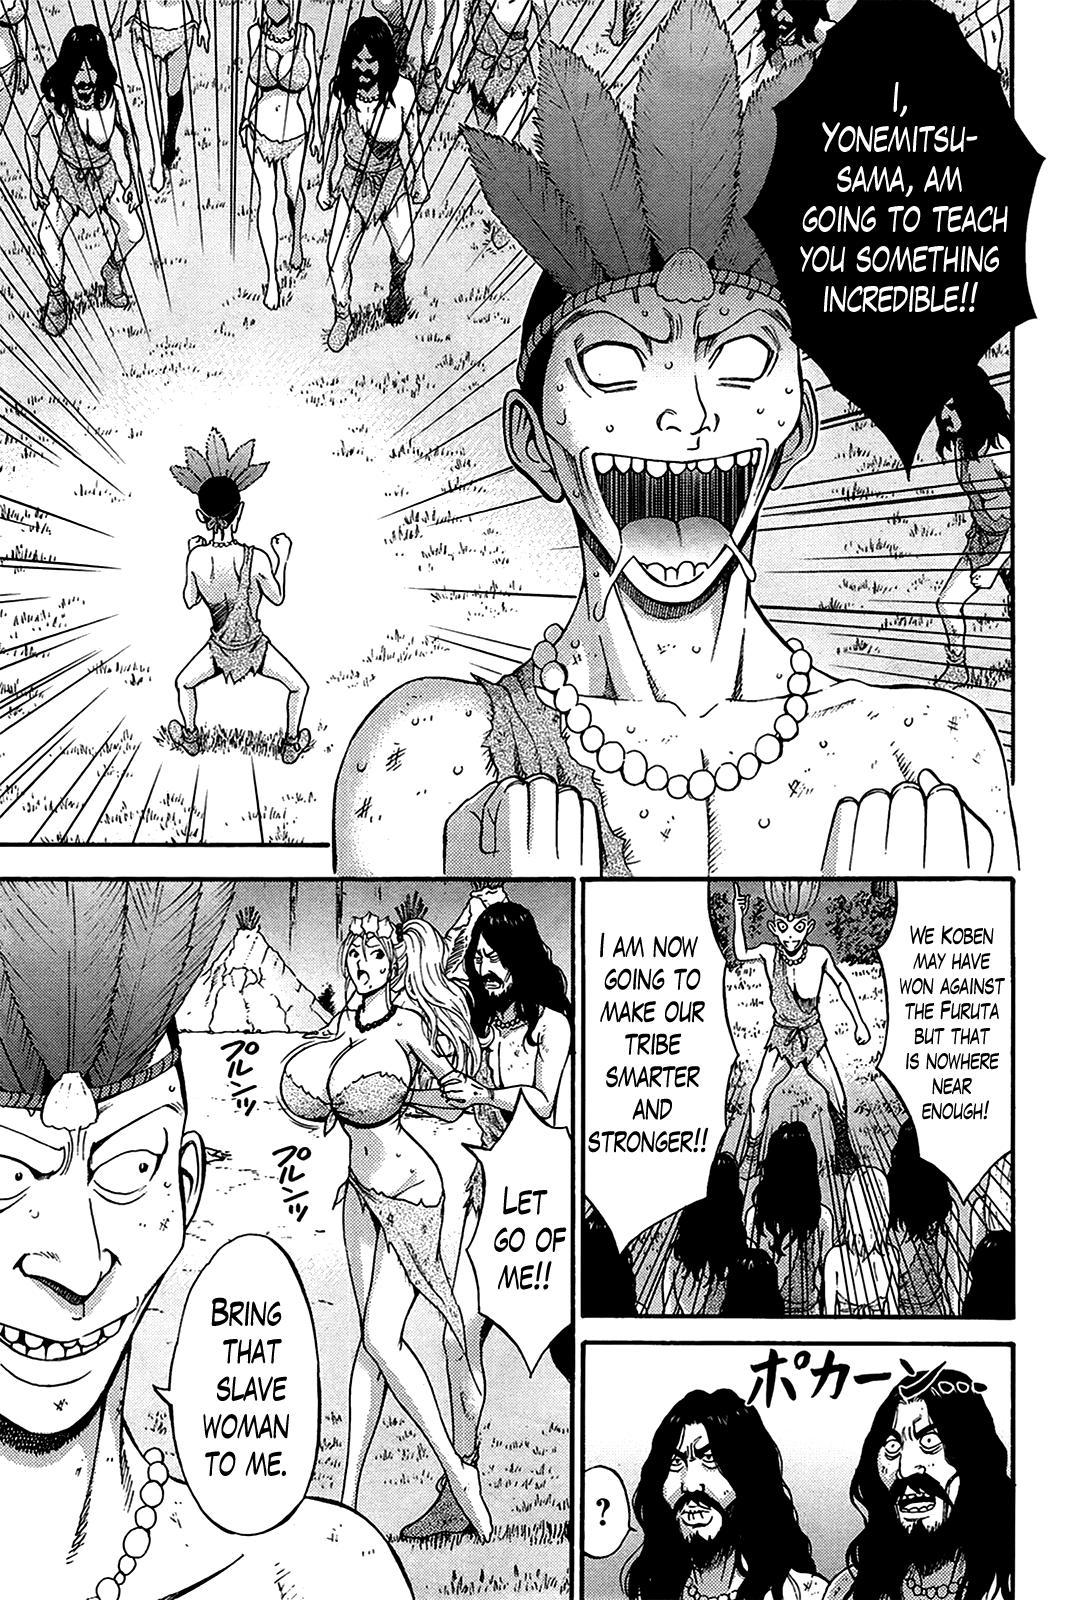 Kigenzen 10000 Nen no Ota | The Otaku in 10,000 B.C. 240